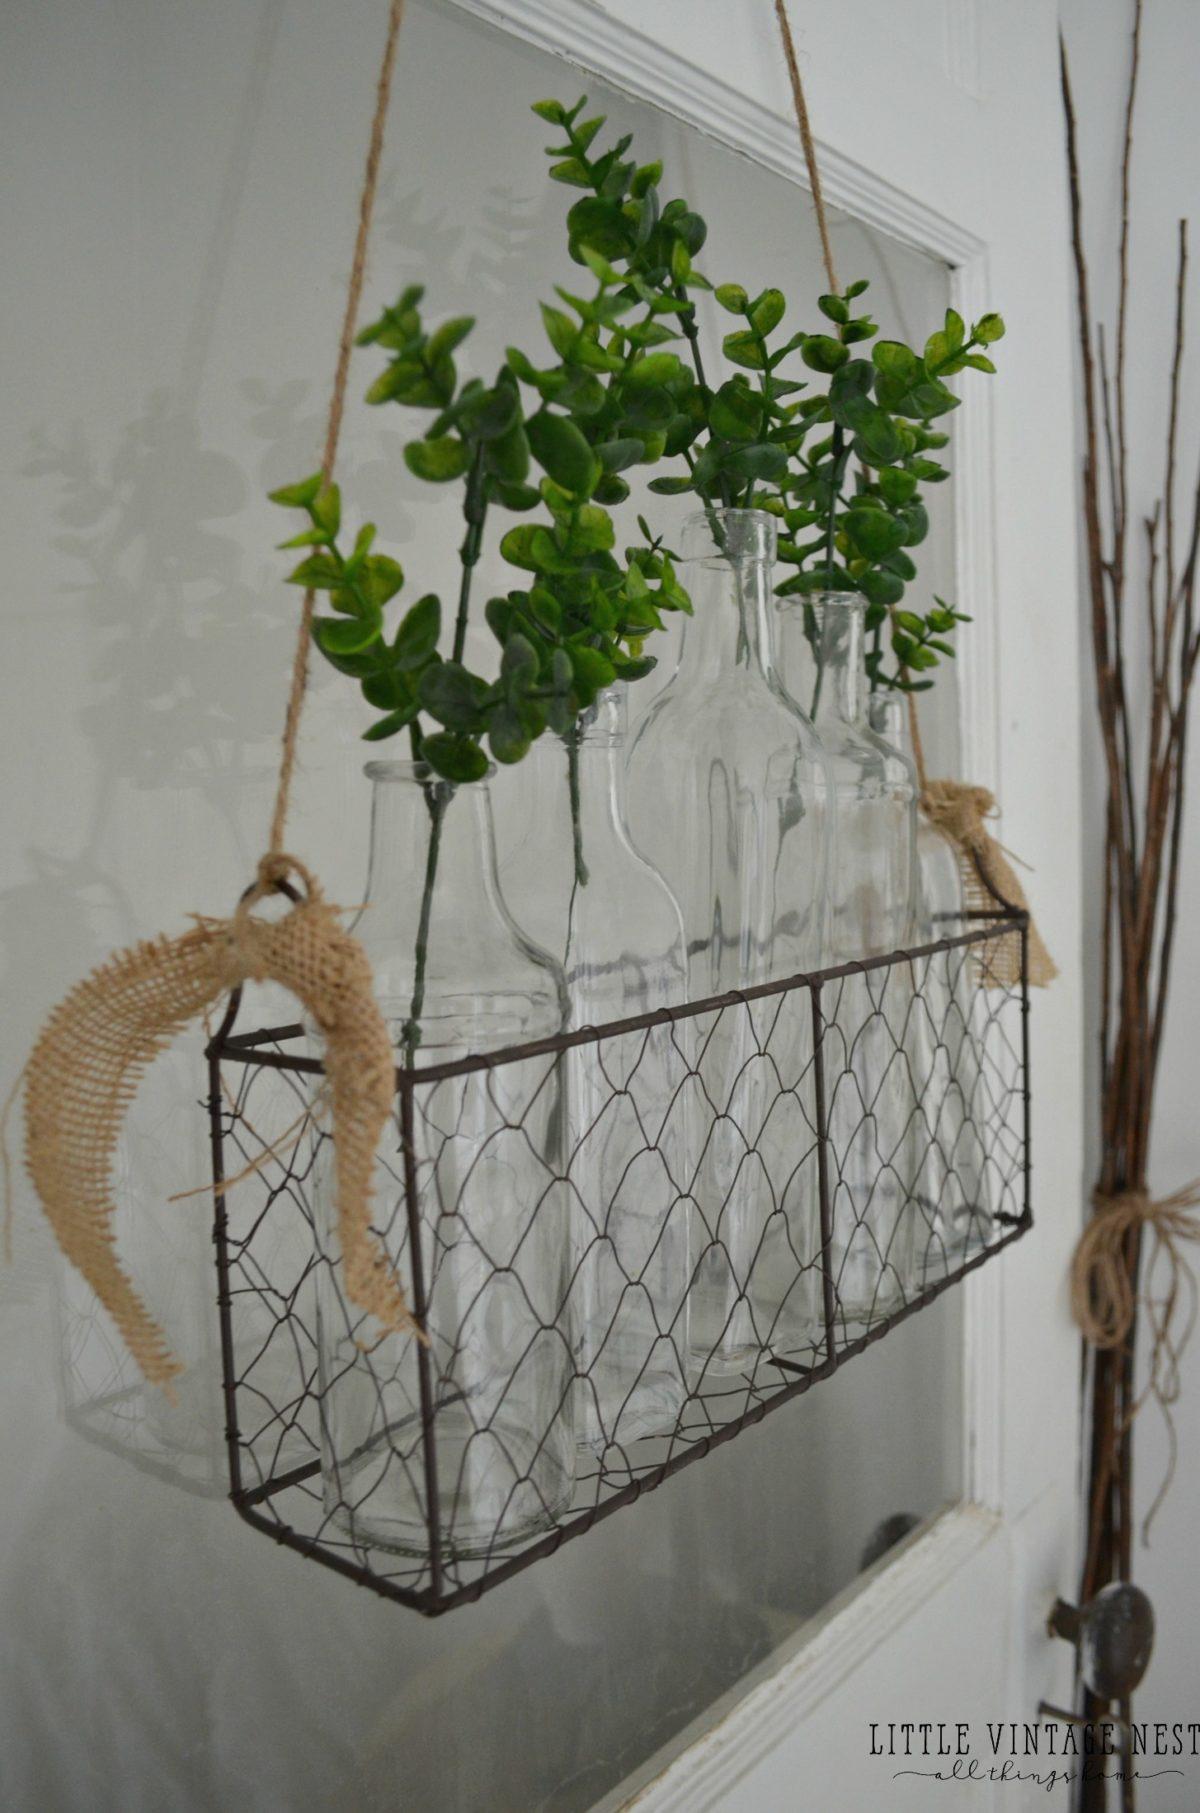 Hanging Basket on Door with Glass Bottles